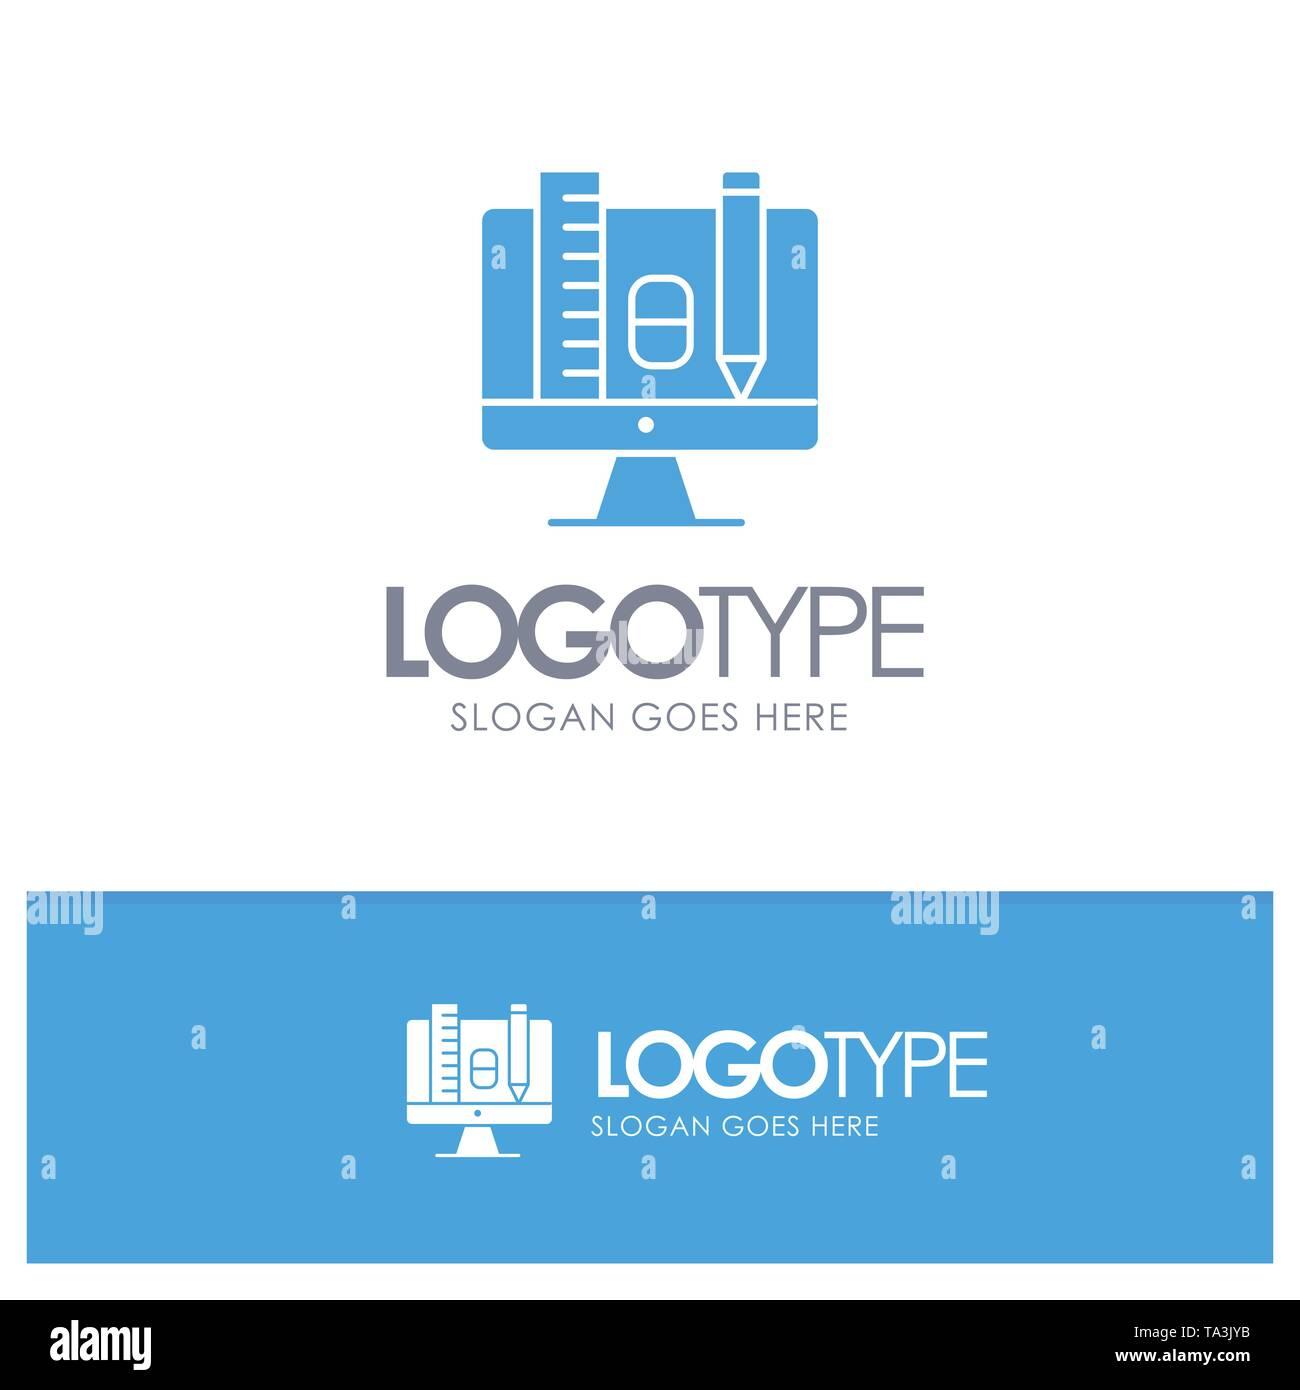 Computer, Education, Scale, Pencil Blue Logo vector - Stock Image